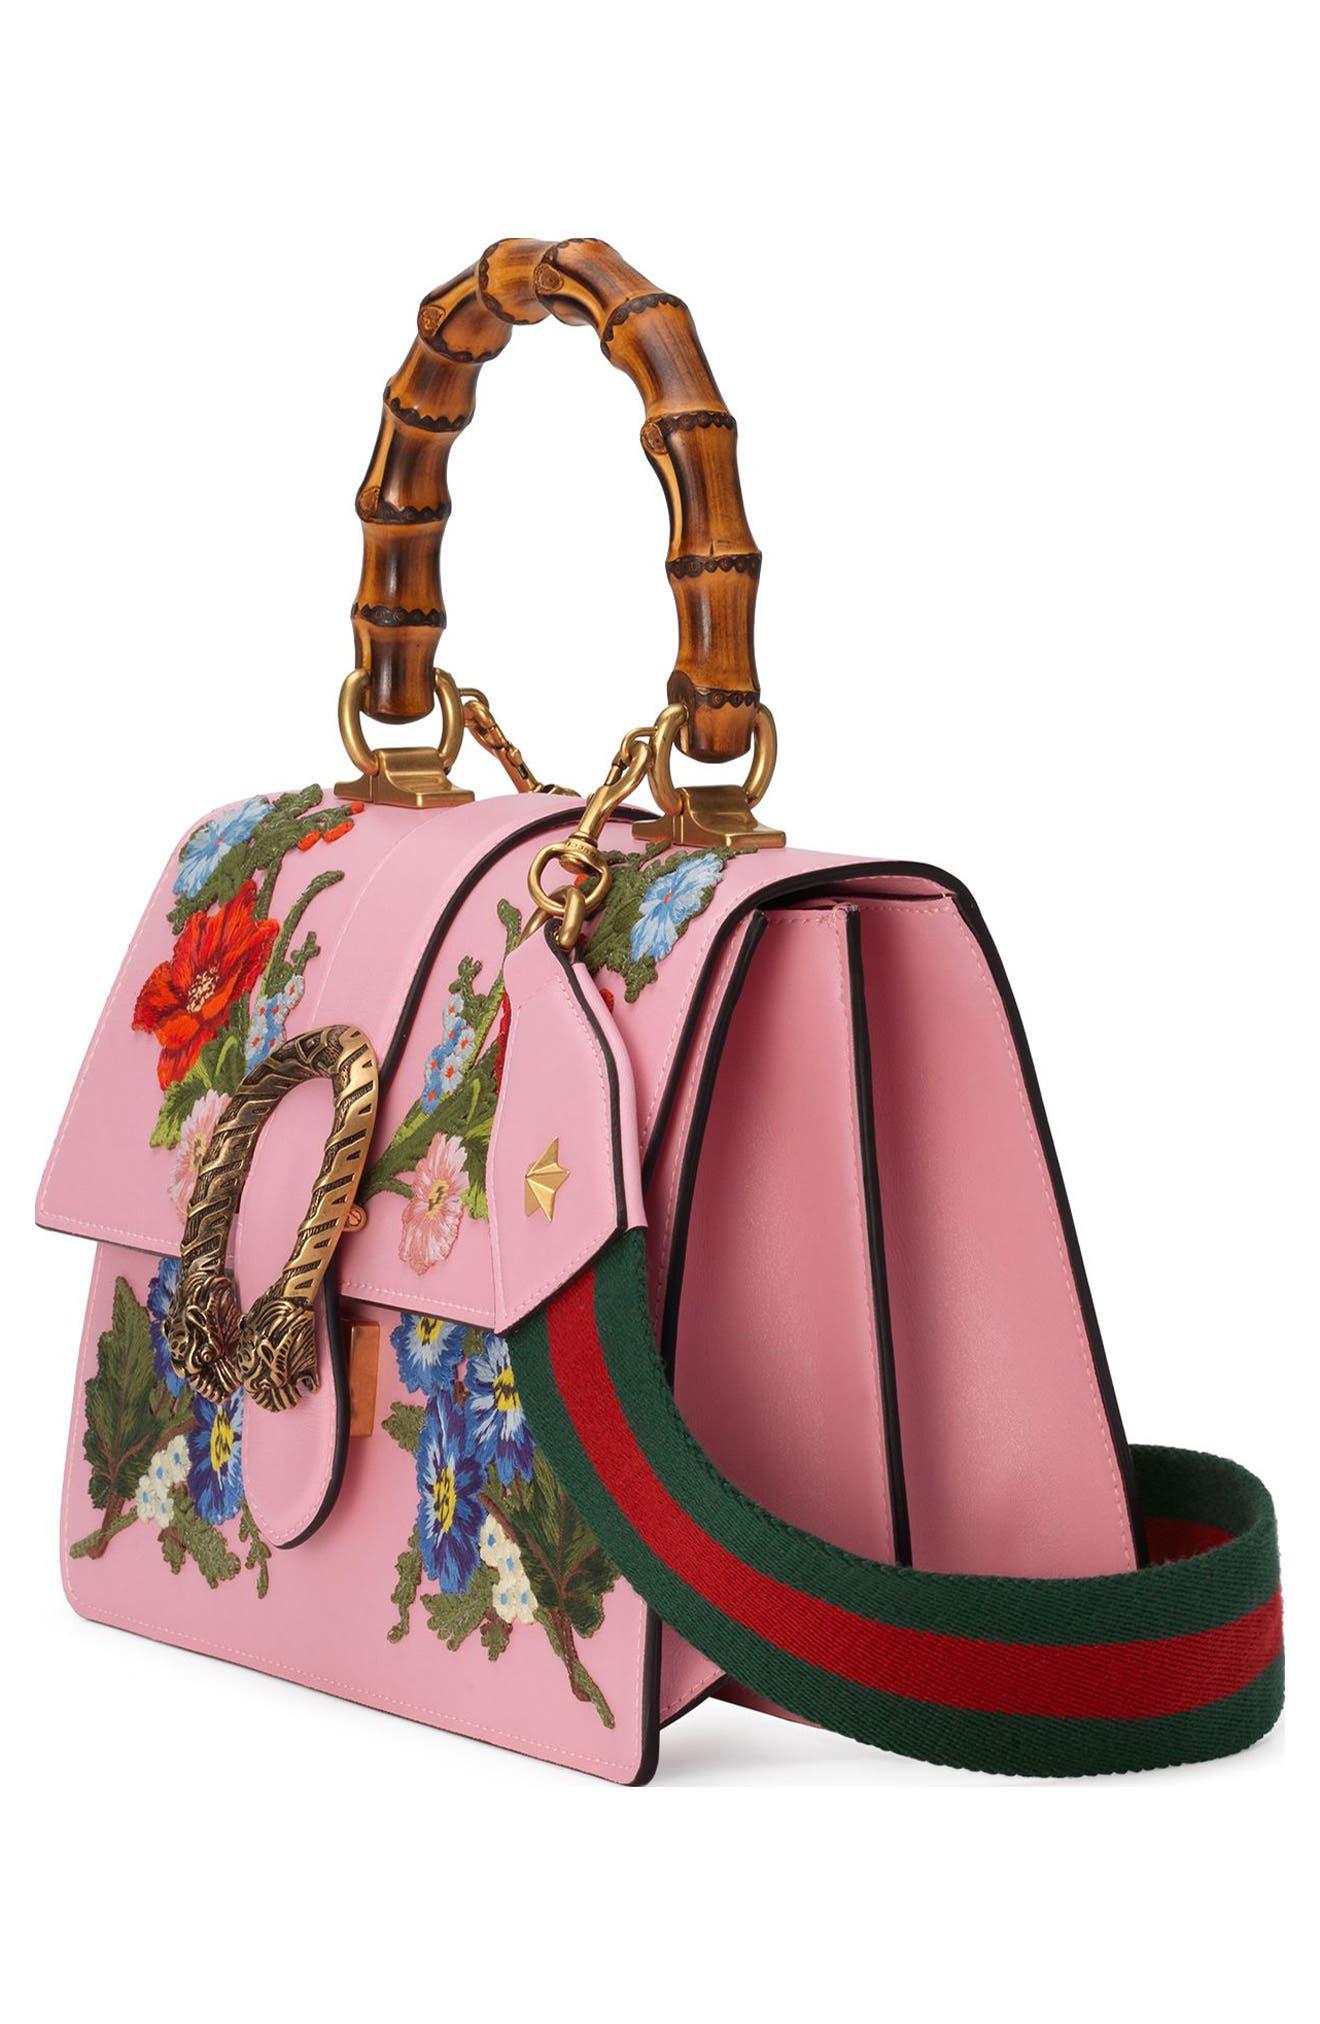 Small Dionysus Top Handle Leather Shoulder Bag,                             Alternate thumbnail 4, color,                             Sugar Pink/Multi